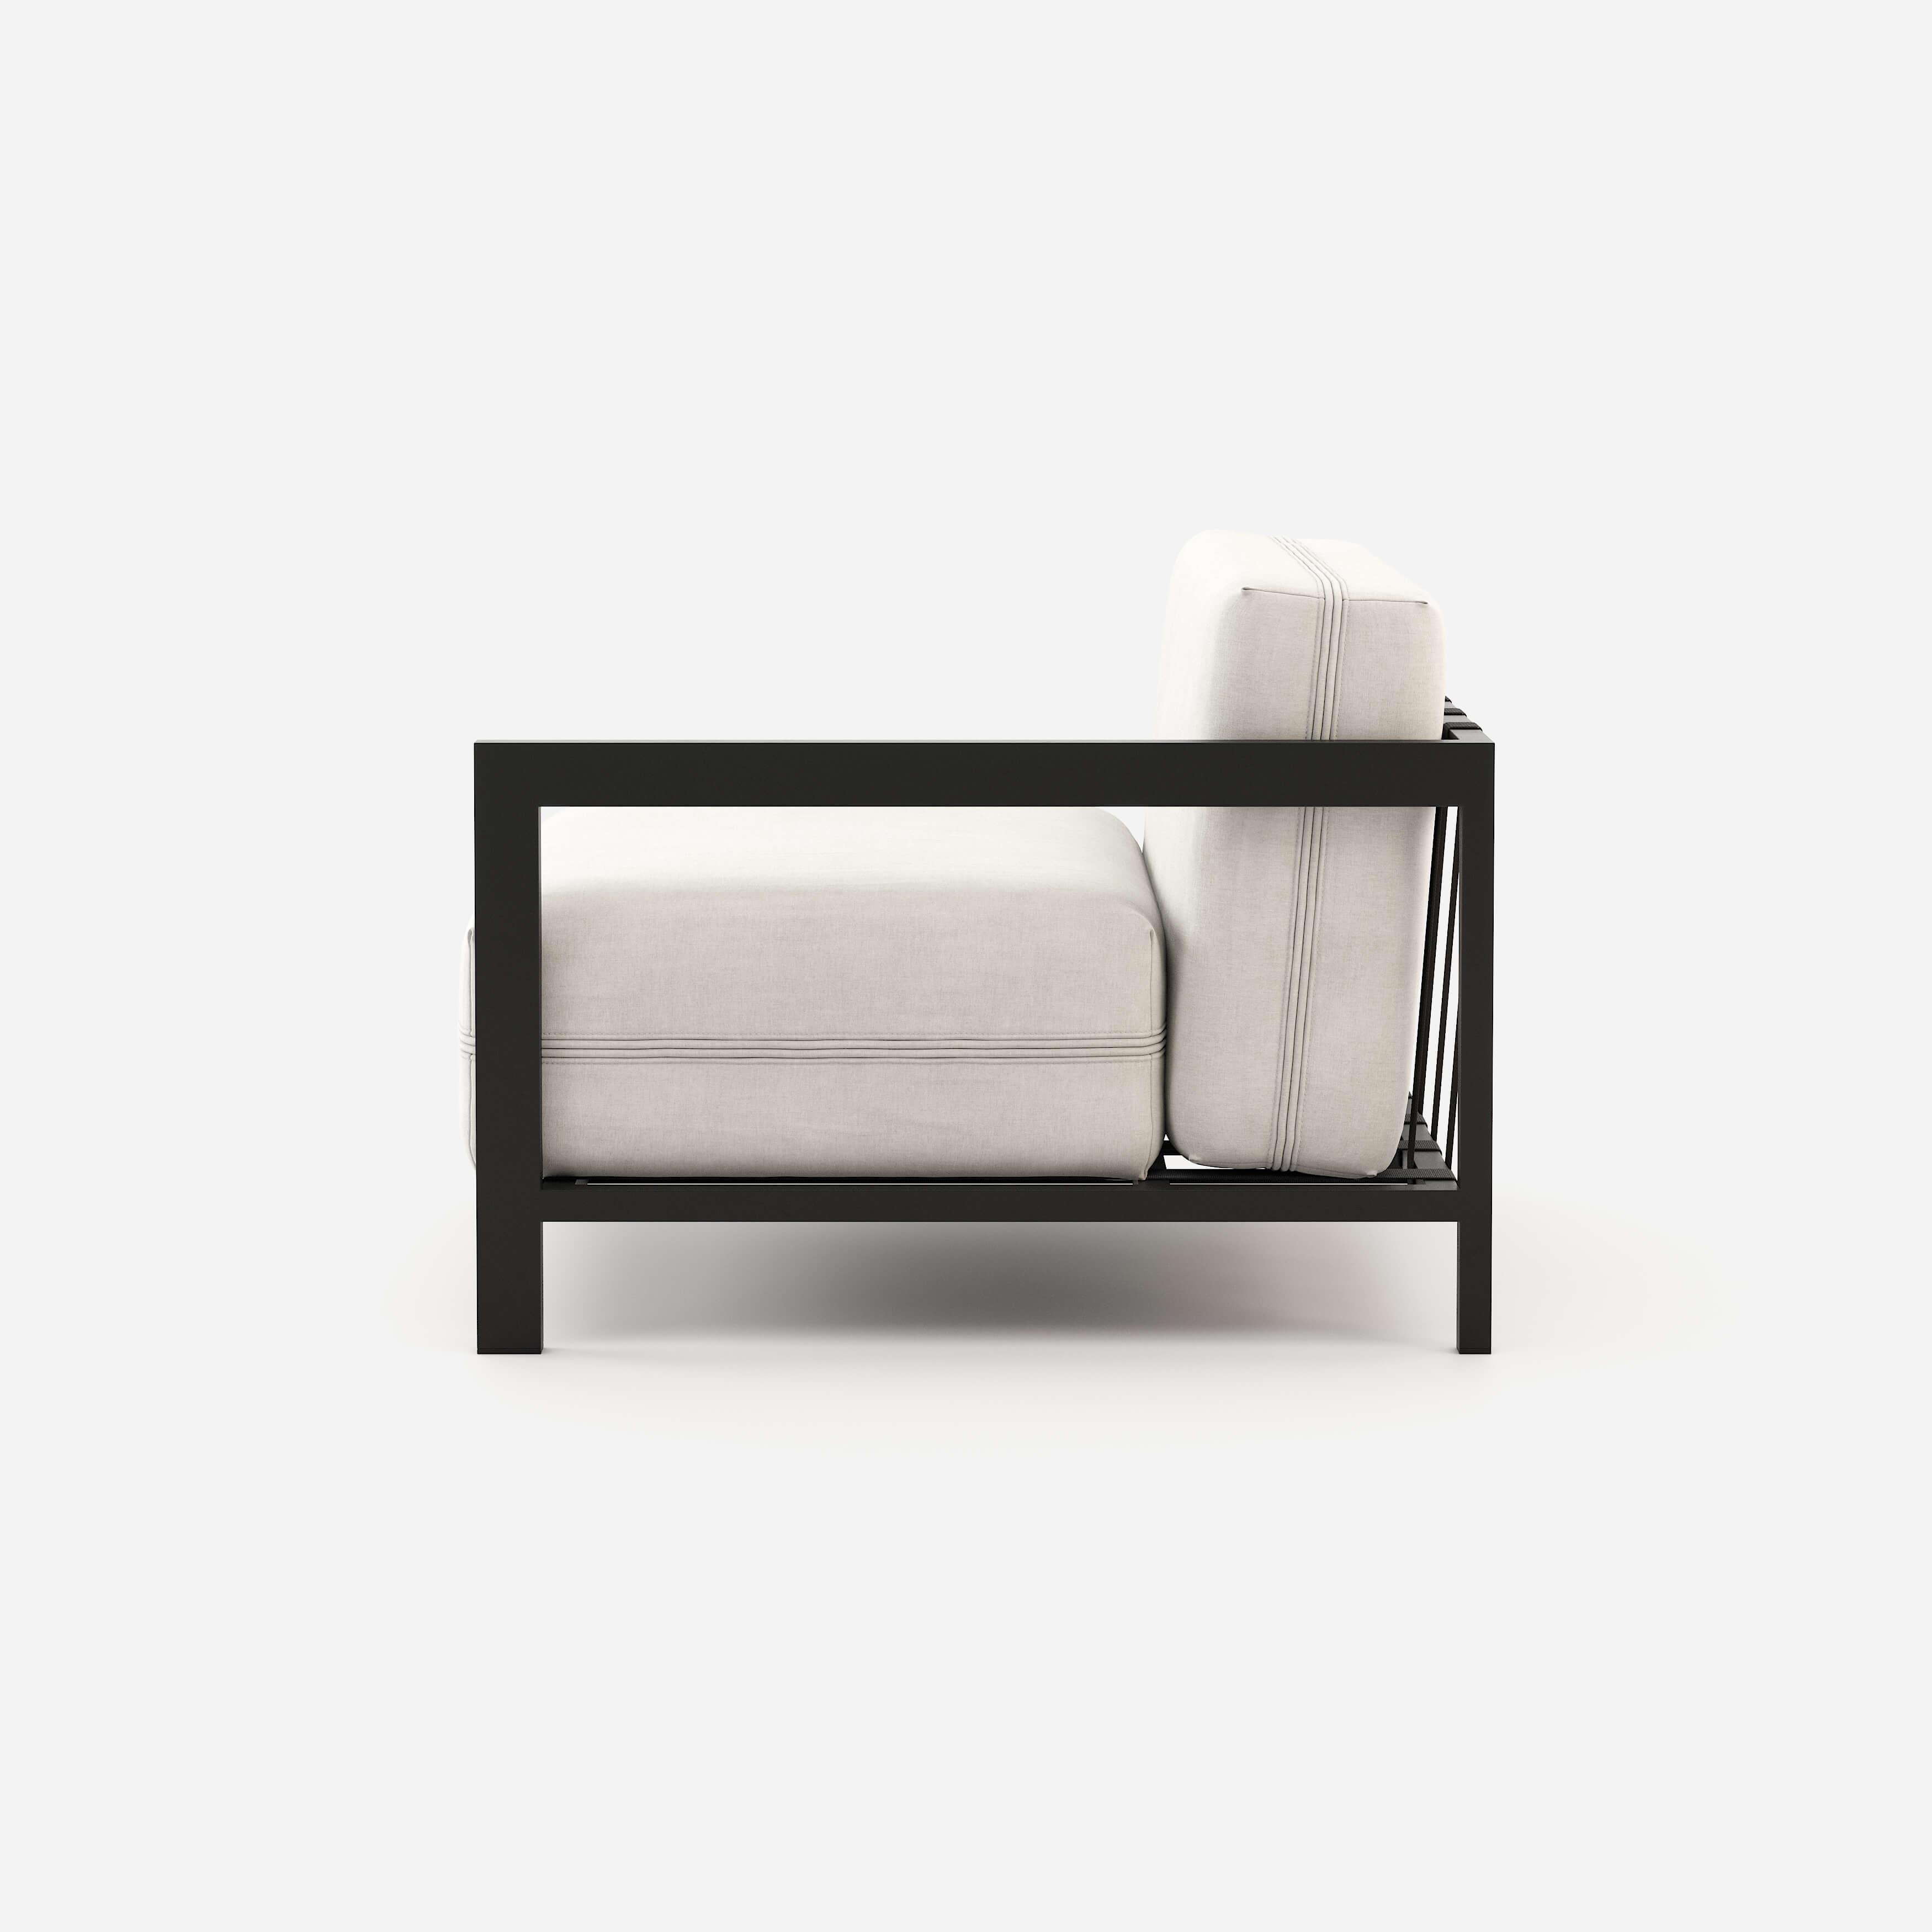 Bondi Right Armrest-domkapa-outdoor-collection-interior-design-home-decor-white-furniture-3